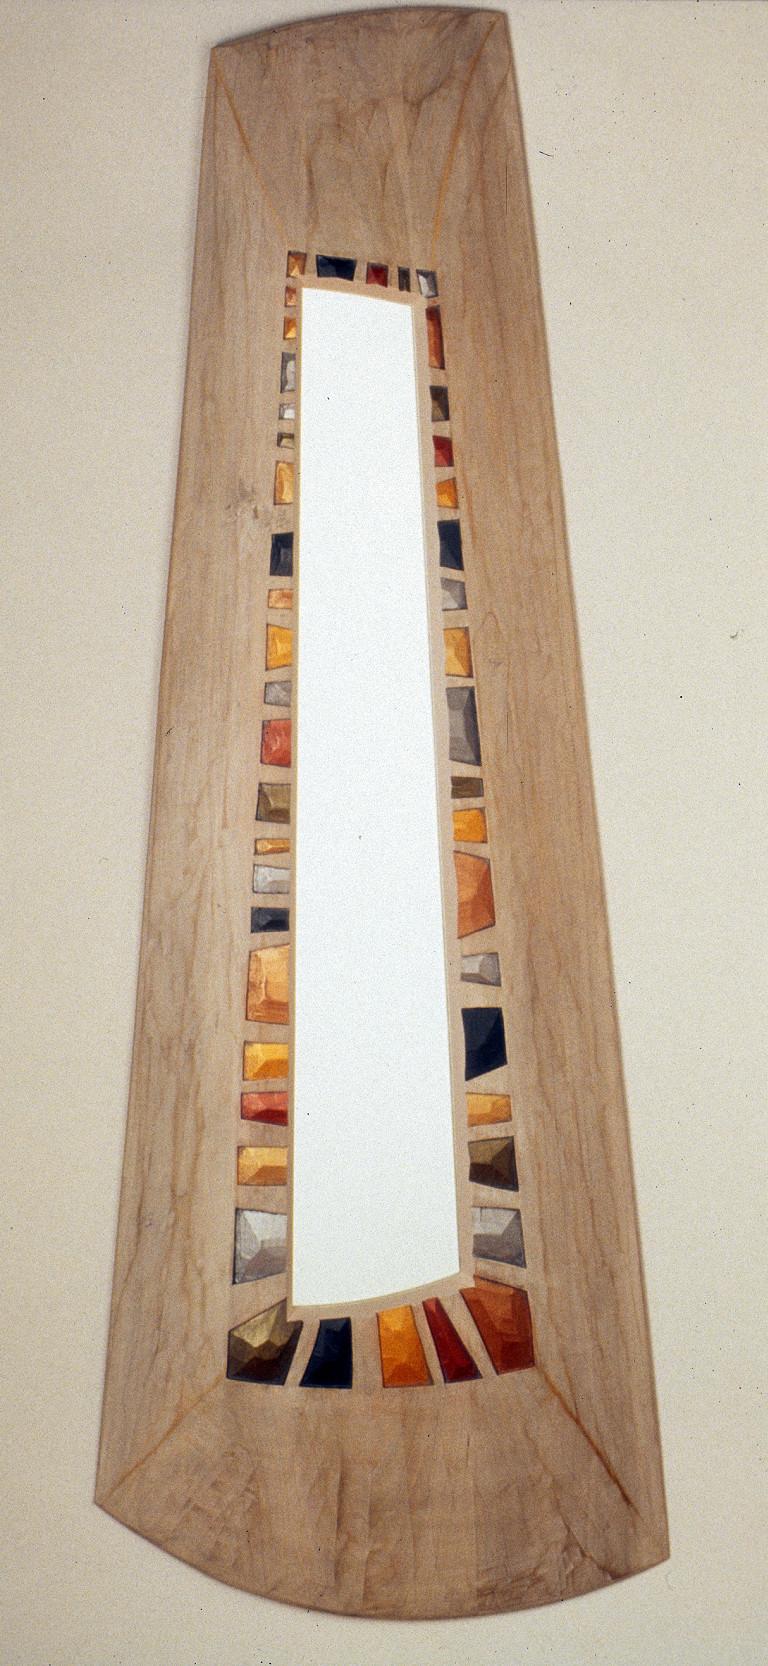 hardwood flooring asheville nc of reflection brent skidmore regarding 23